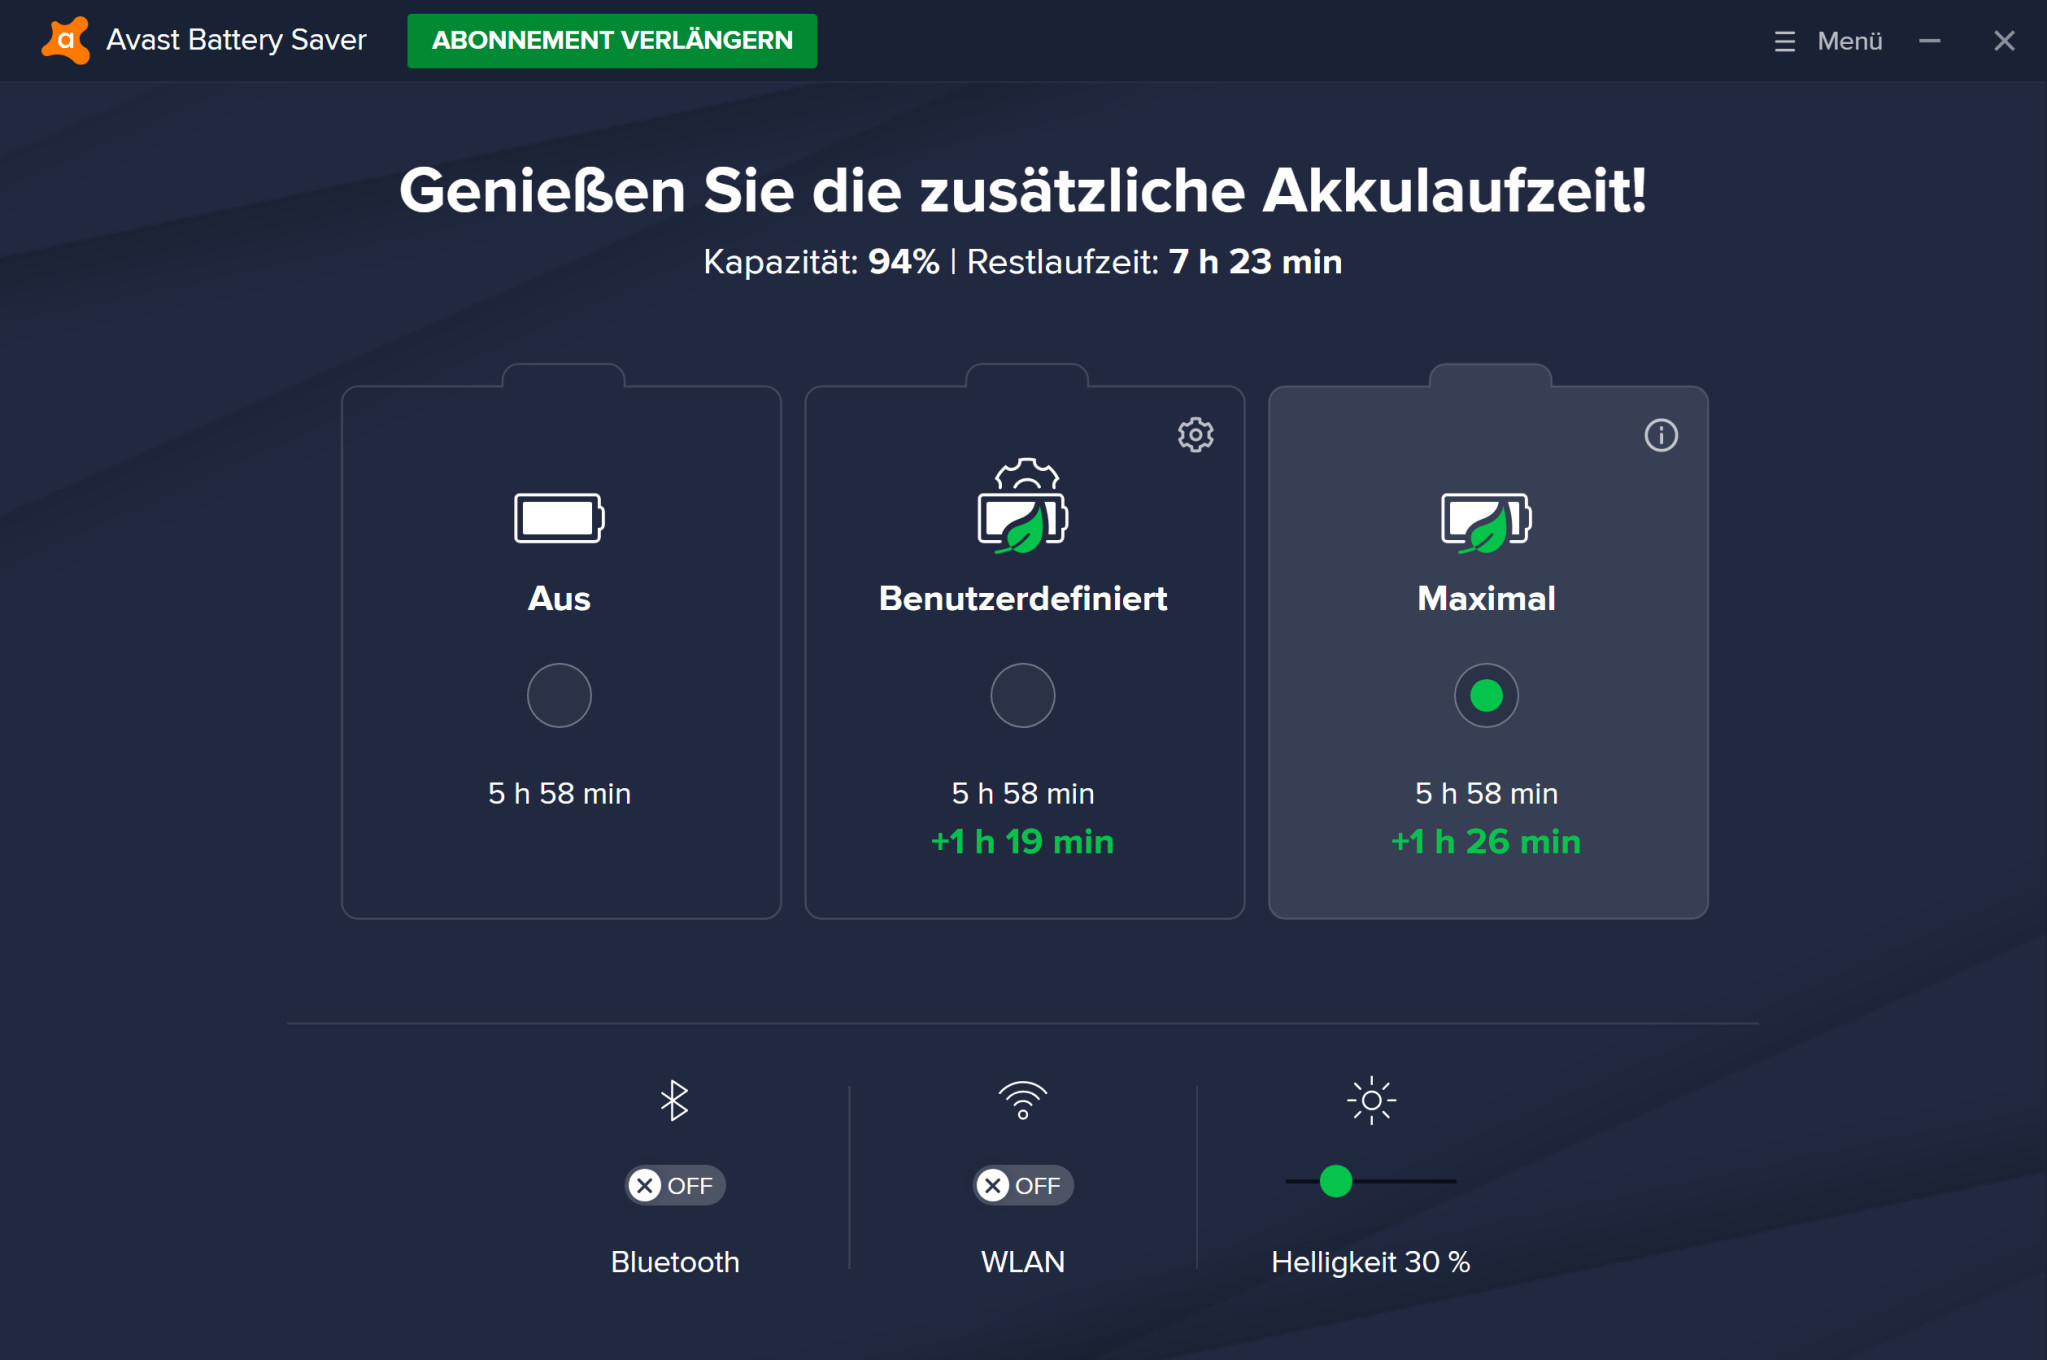 Screenshot 1 - Avast Battery Saver